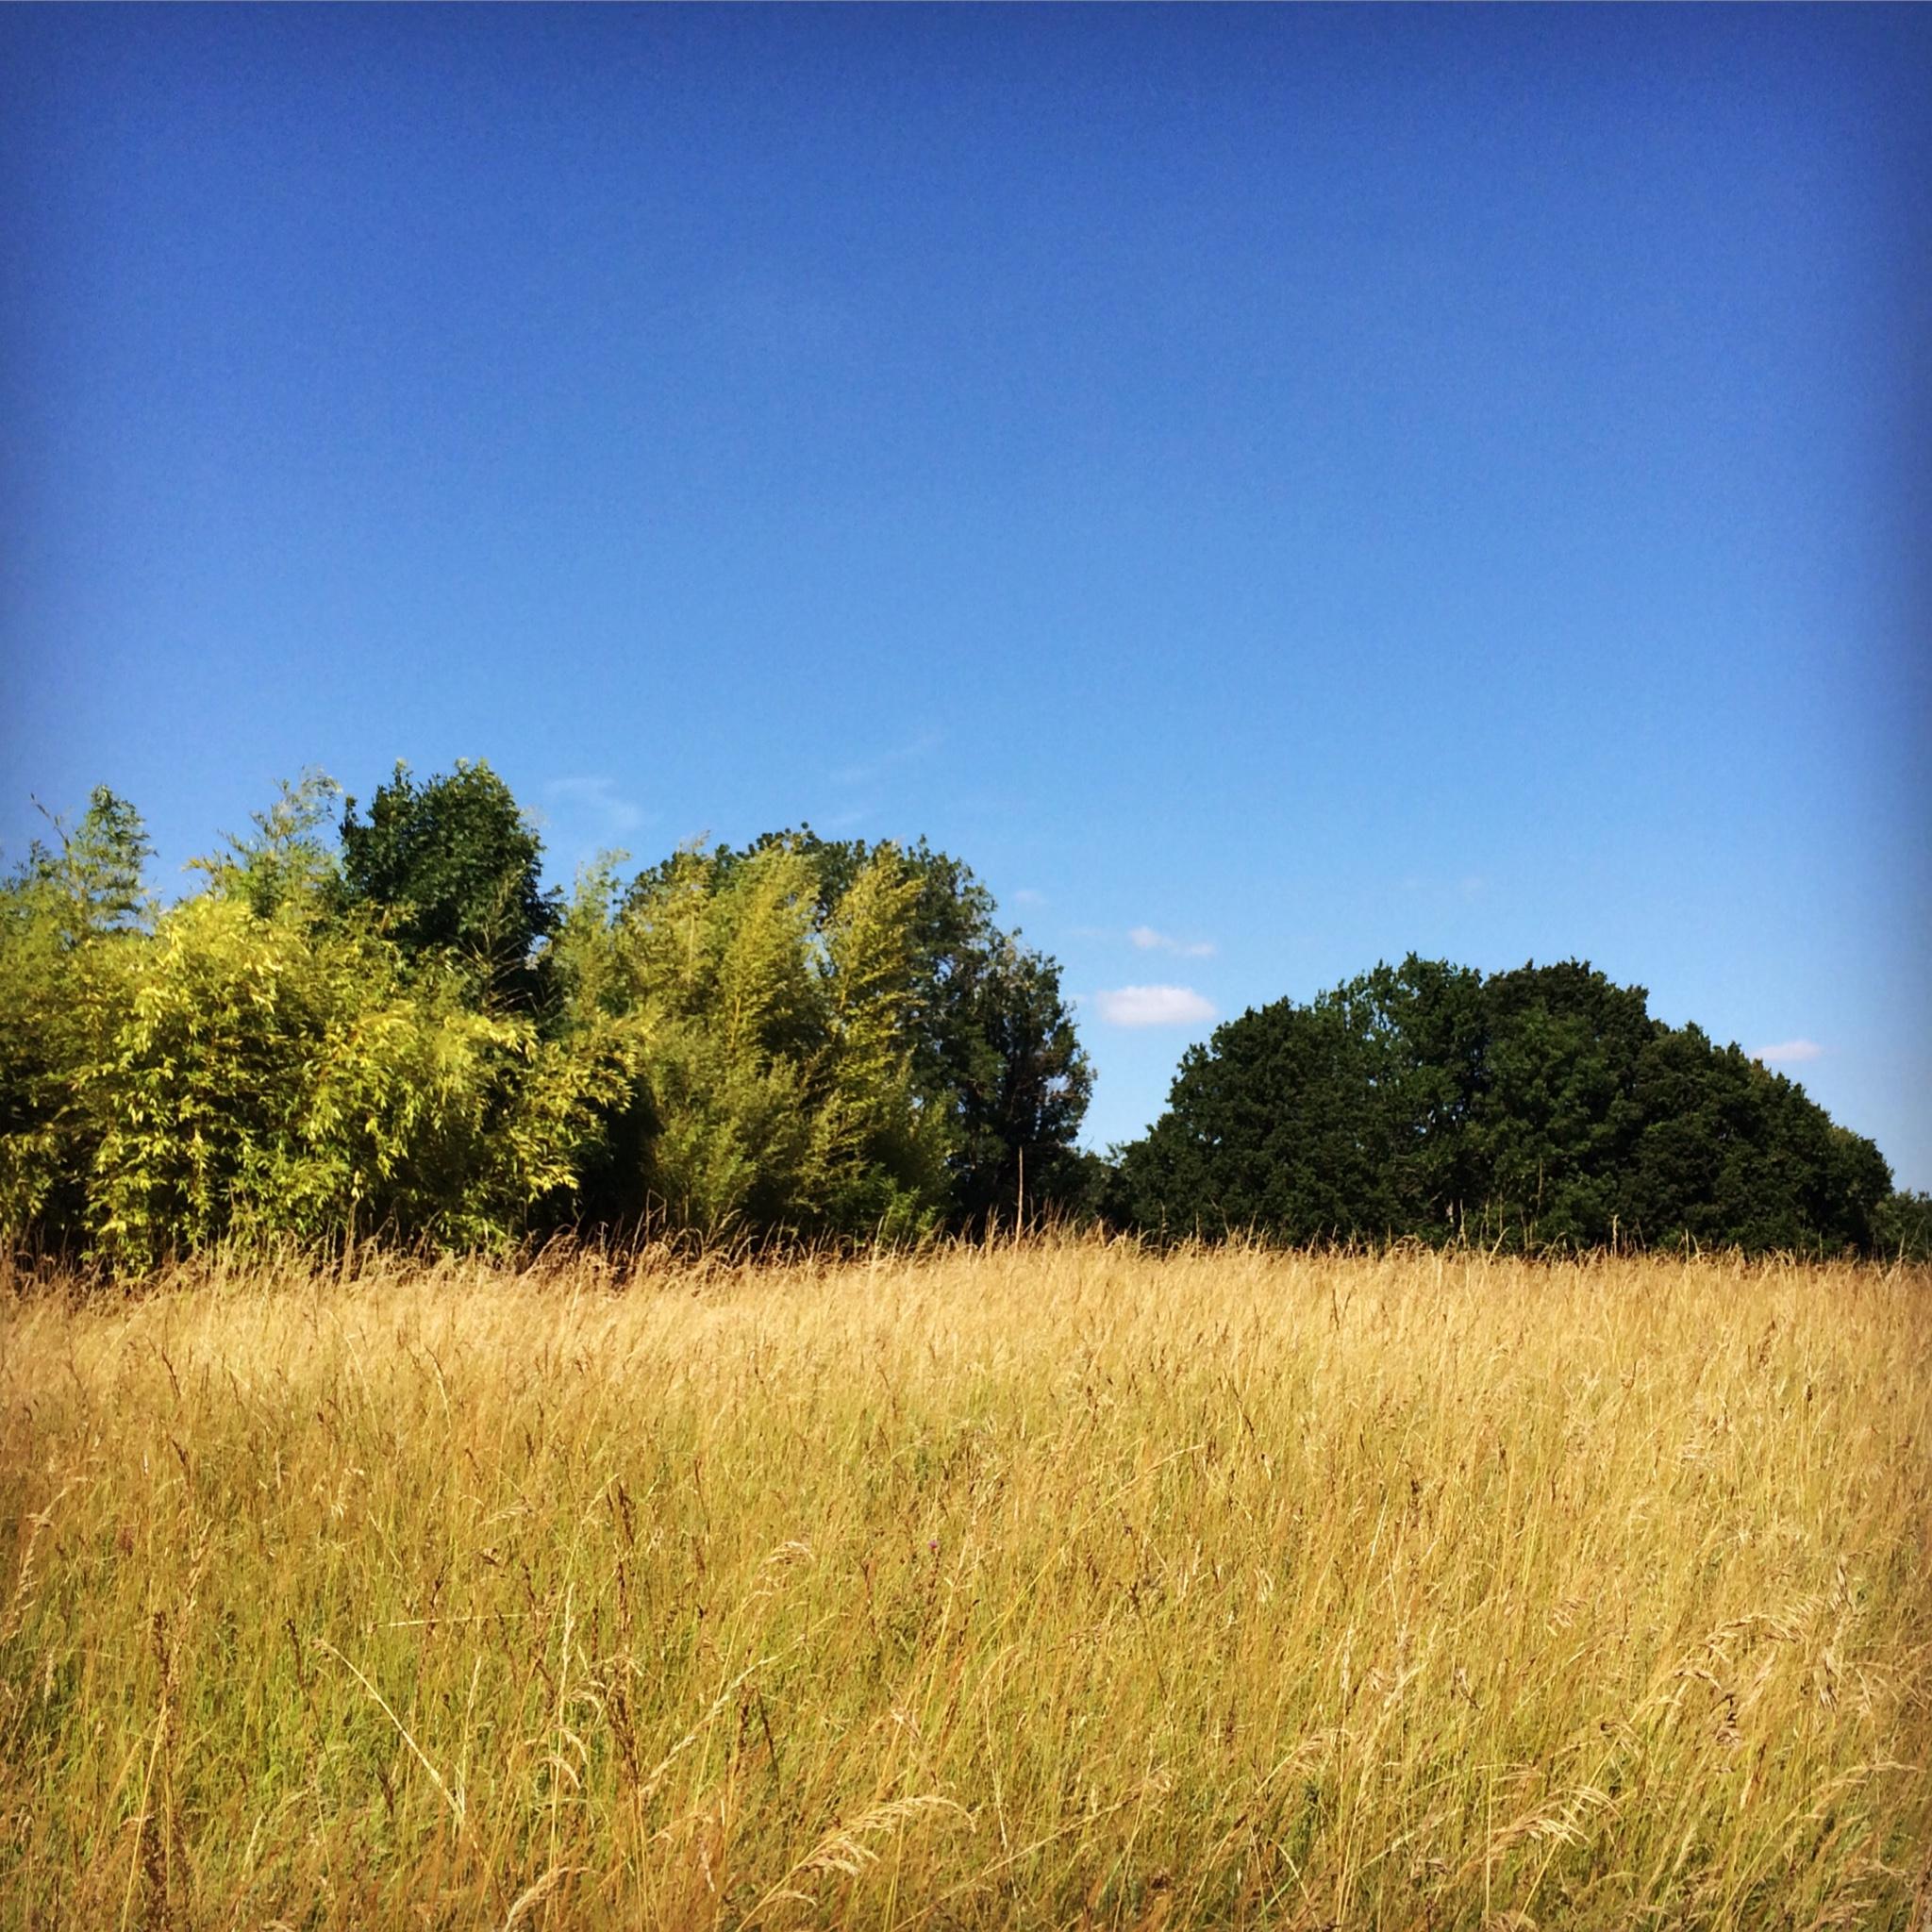 Tall grasses / Fleurac, France